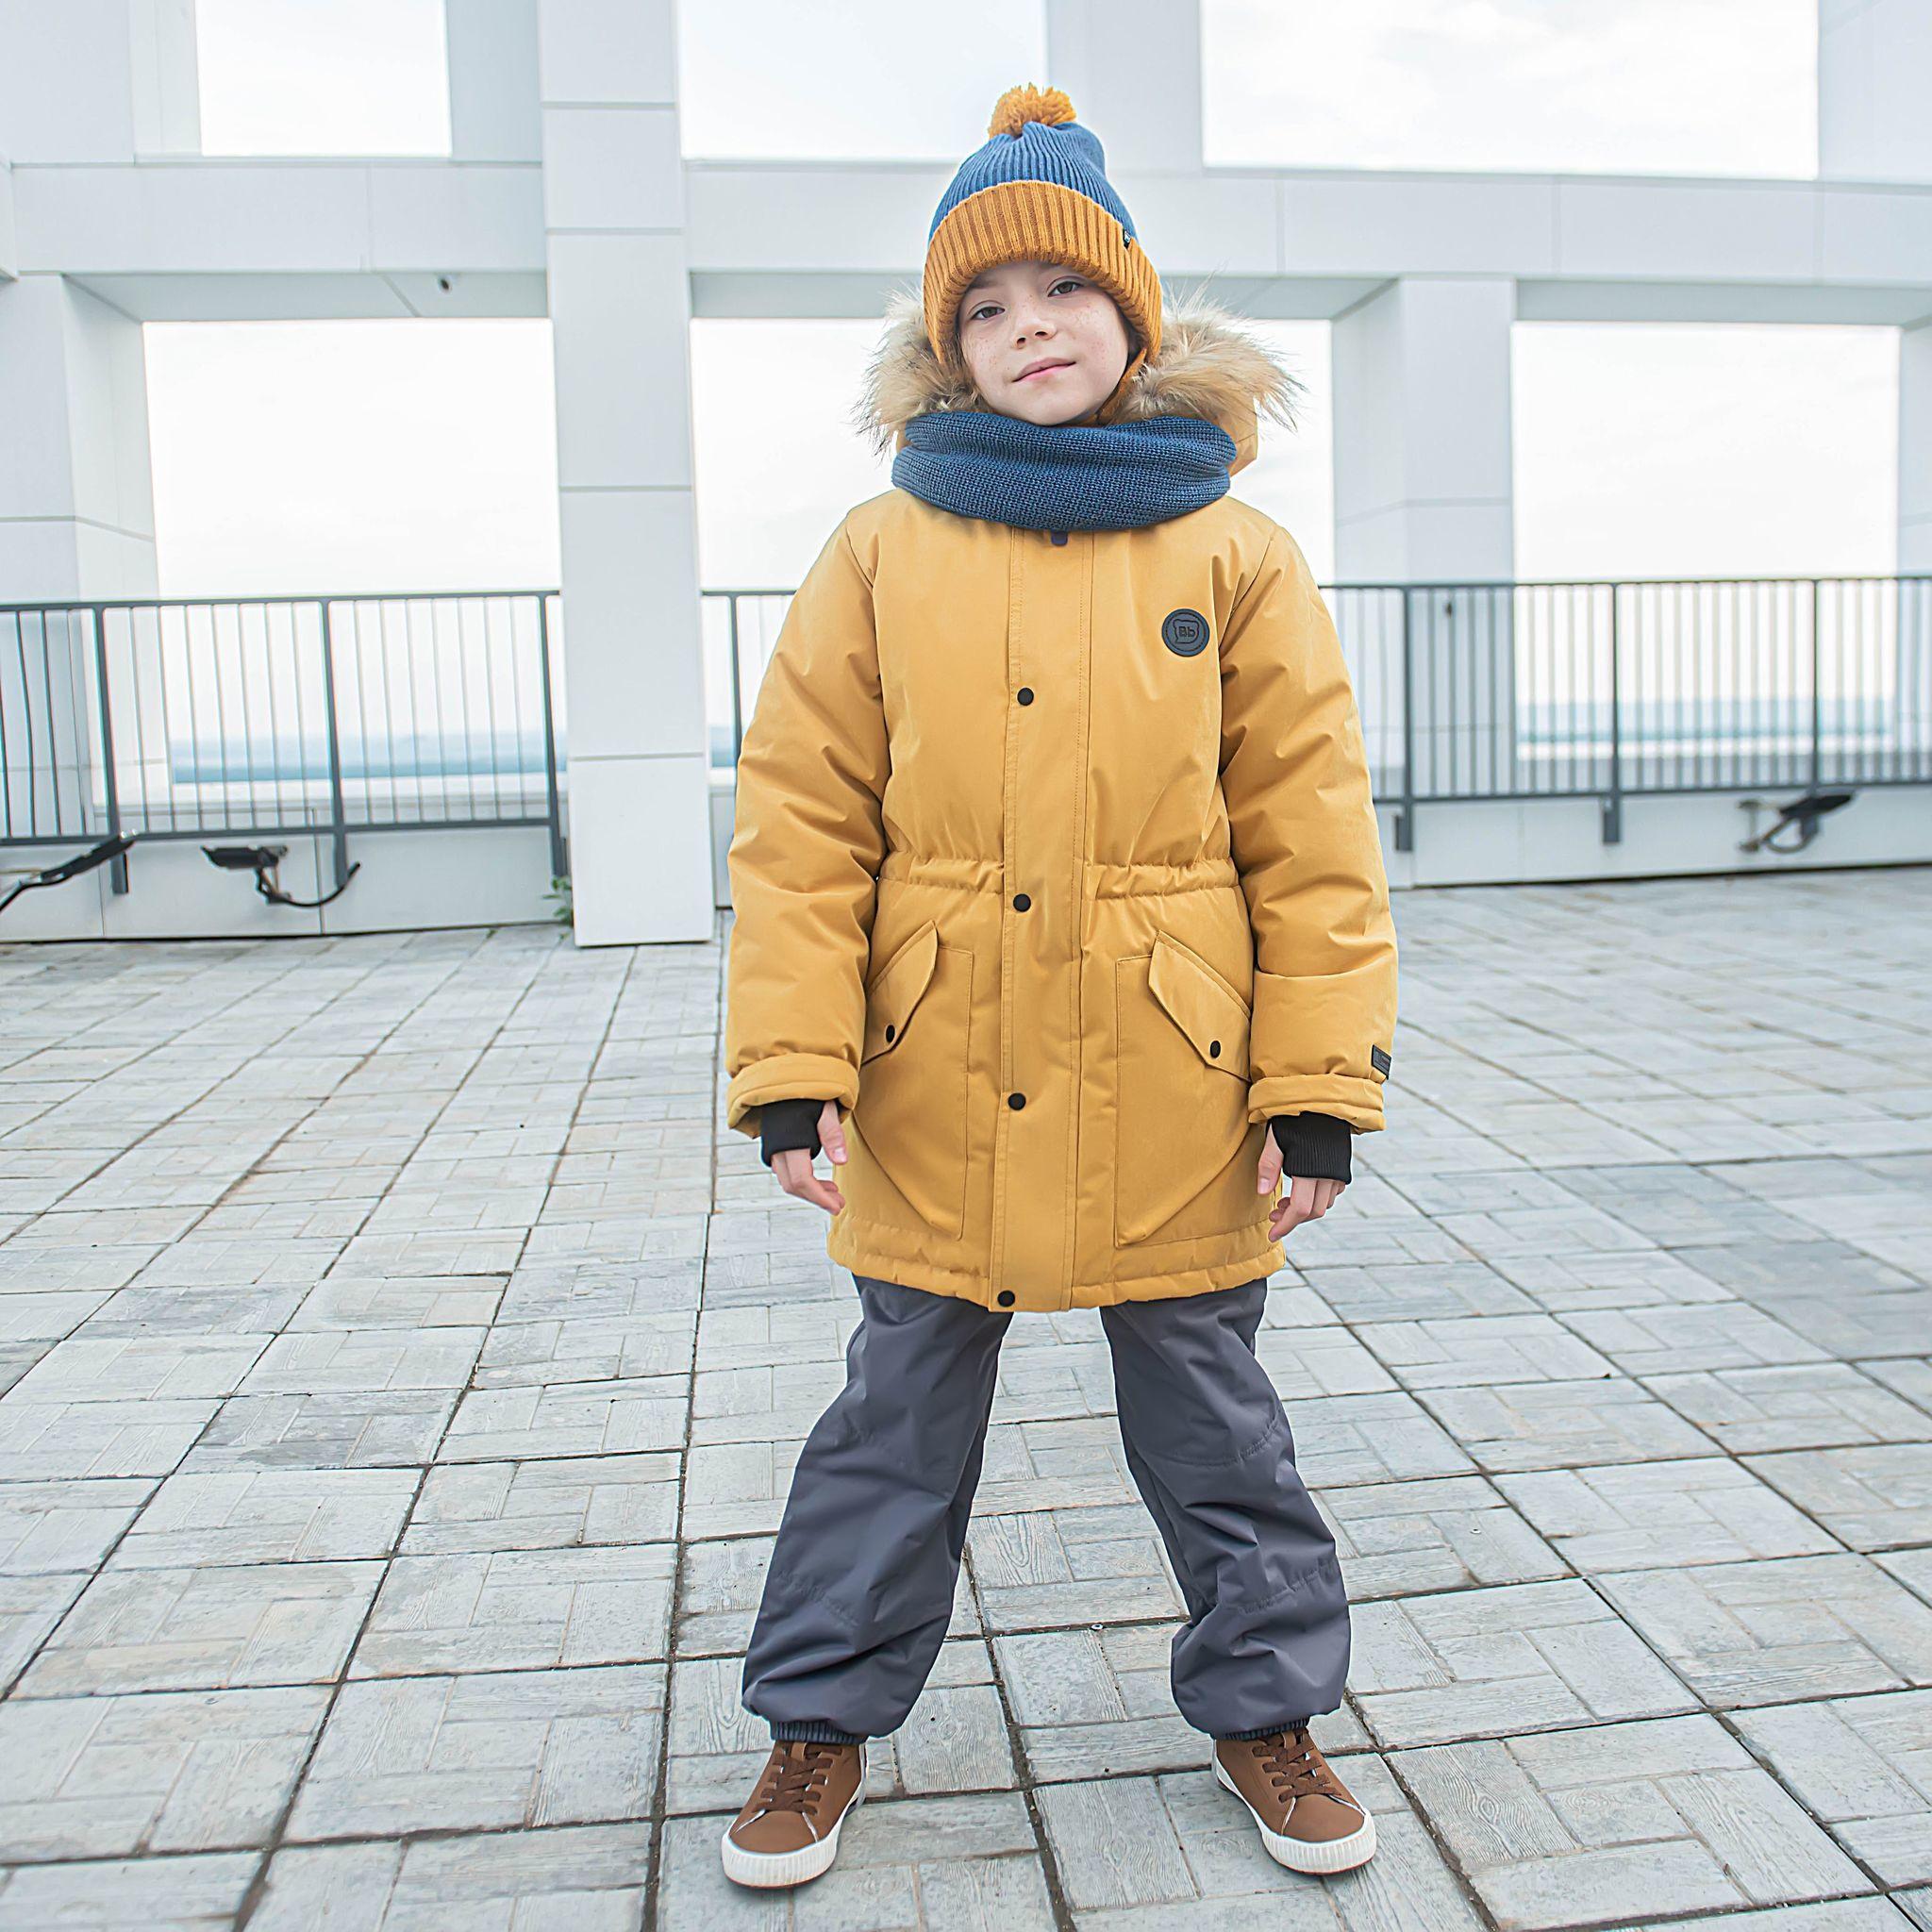 Winter membrane parka for teens - Mustard